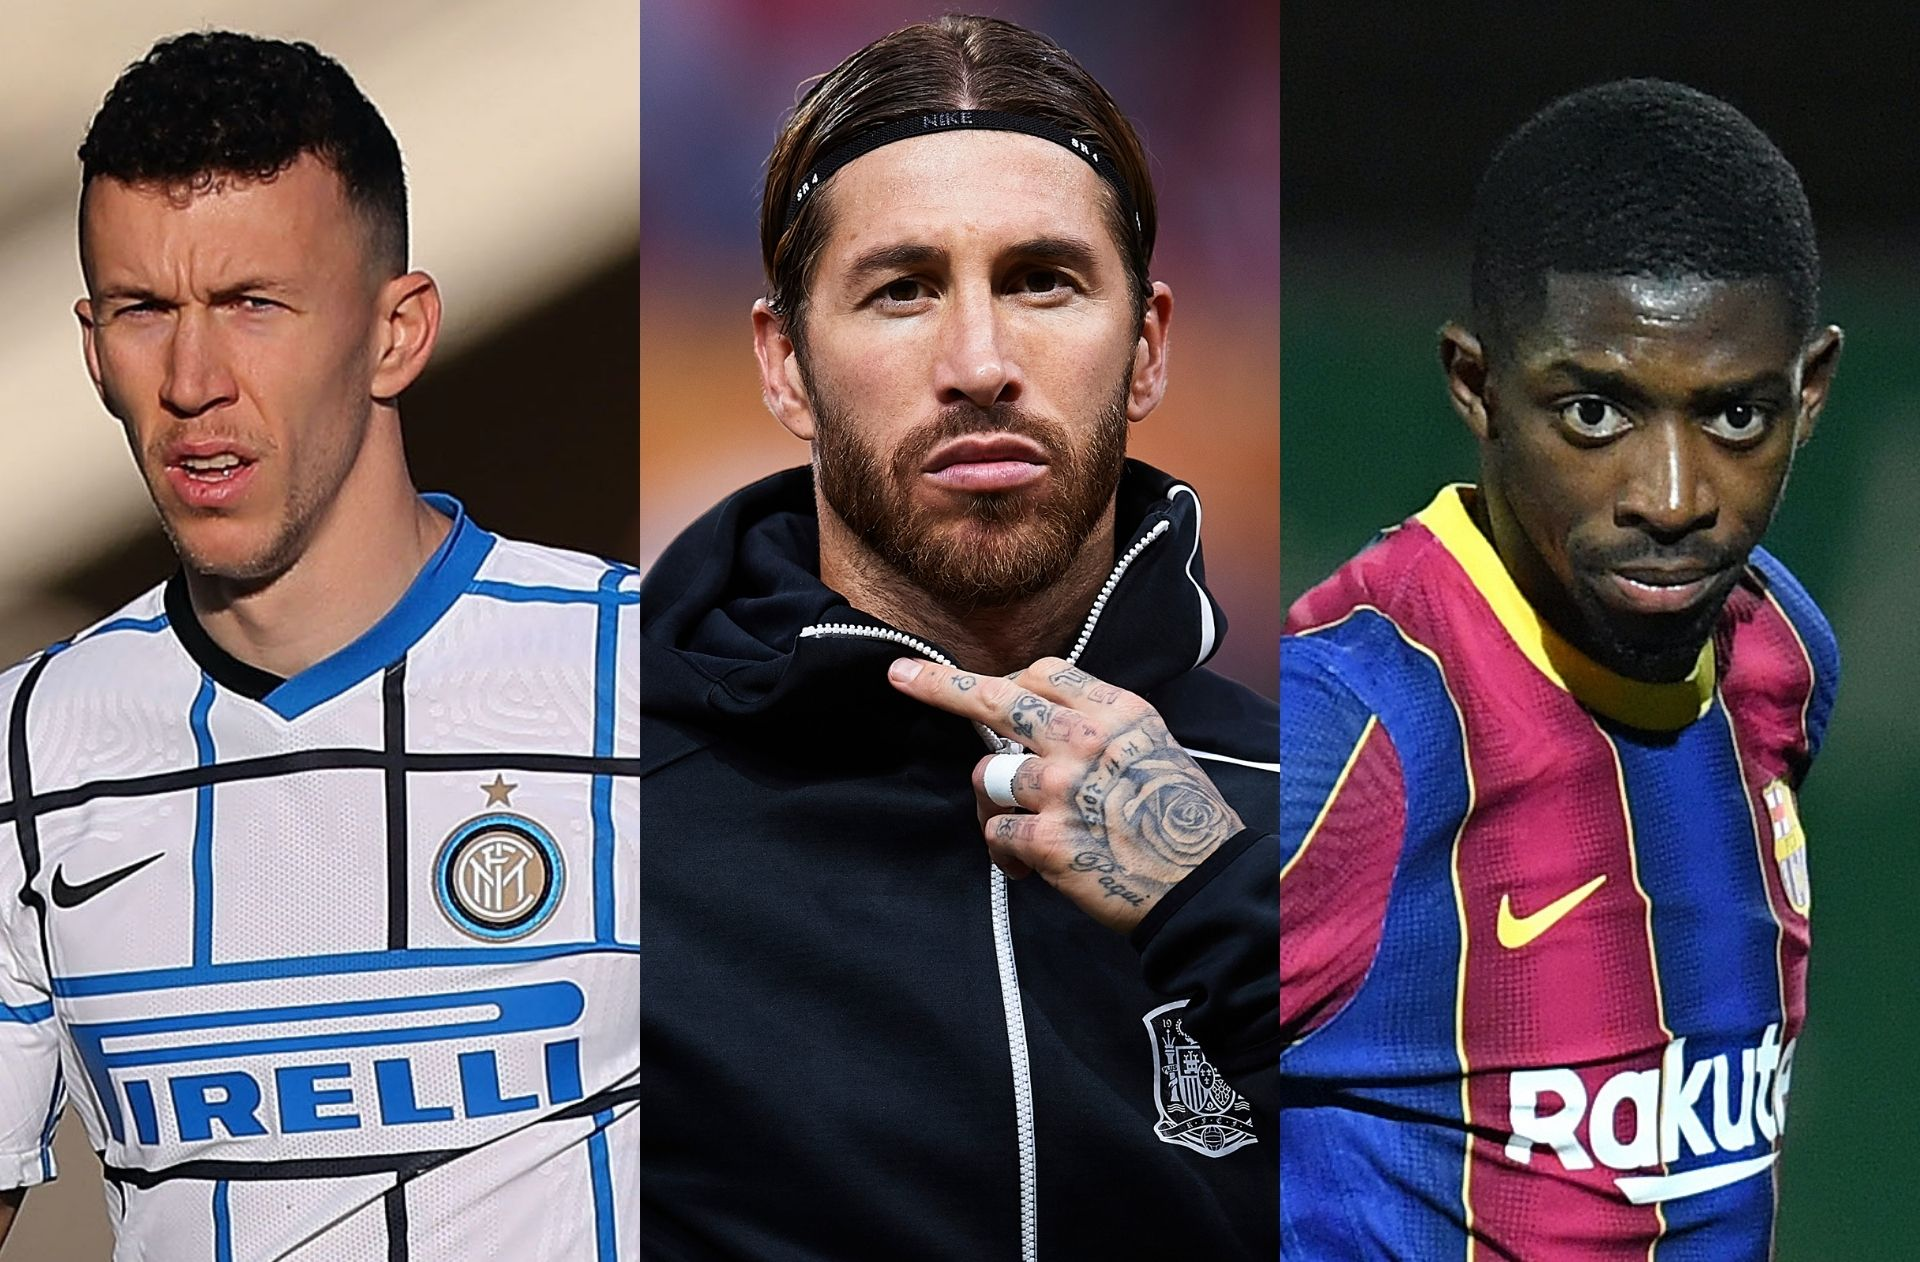 Sunday's transfer rumors - Ramos' preferred new club revealed